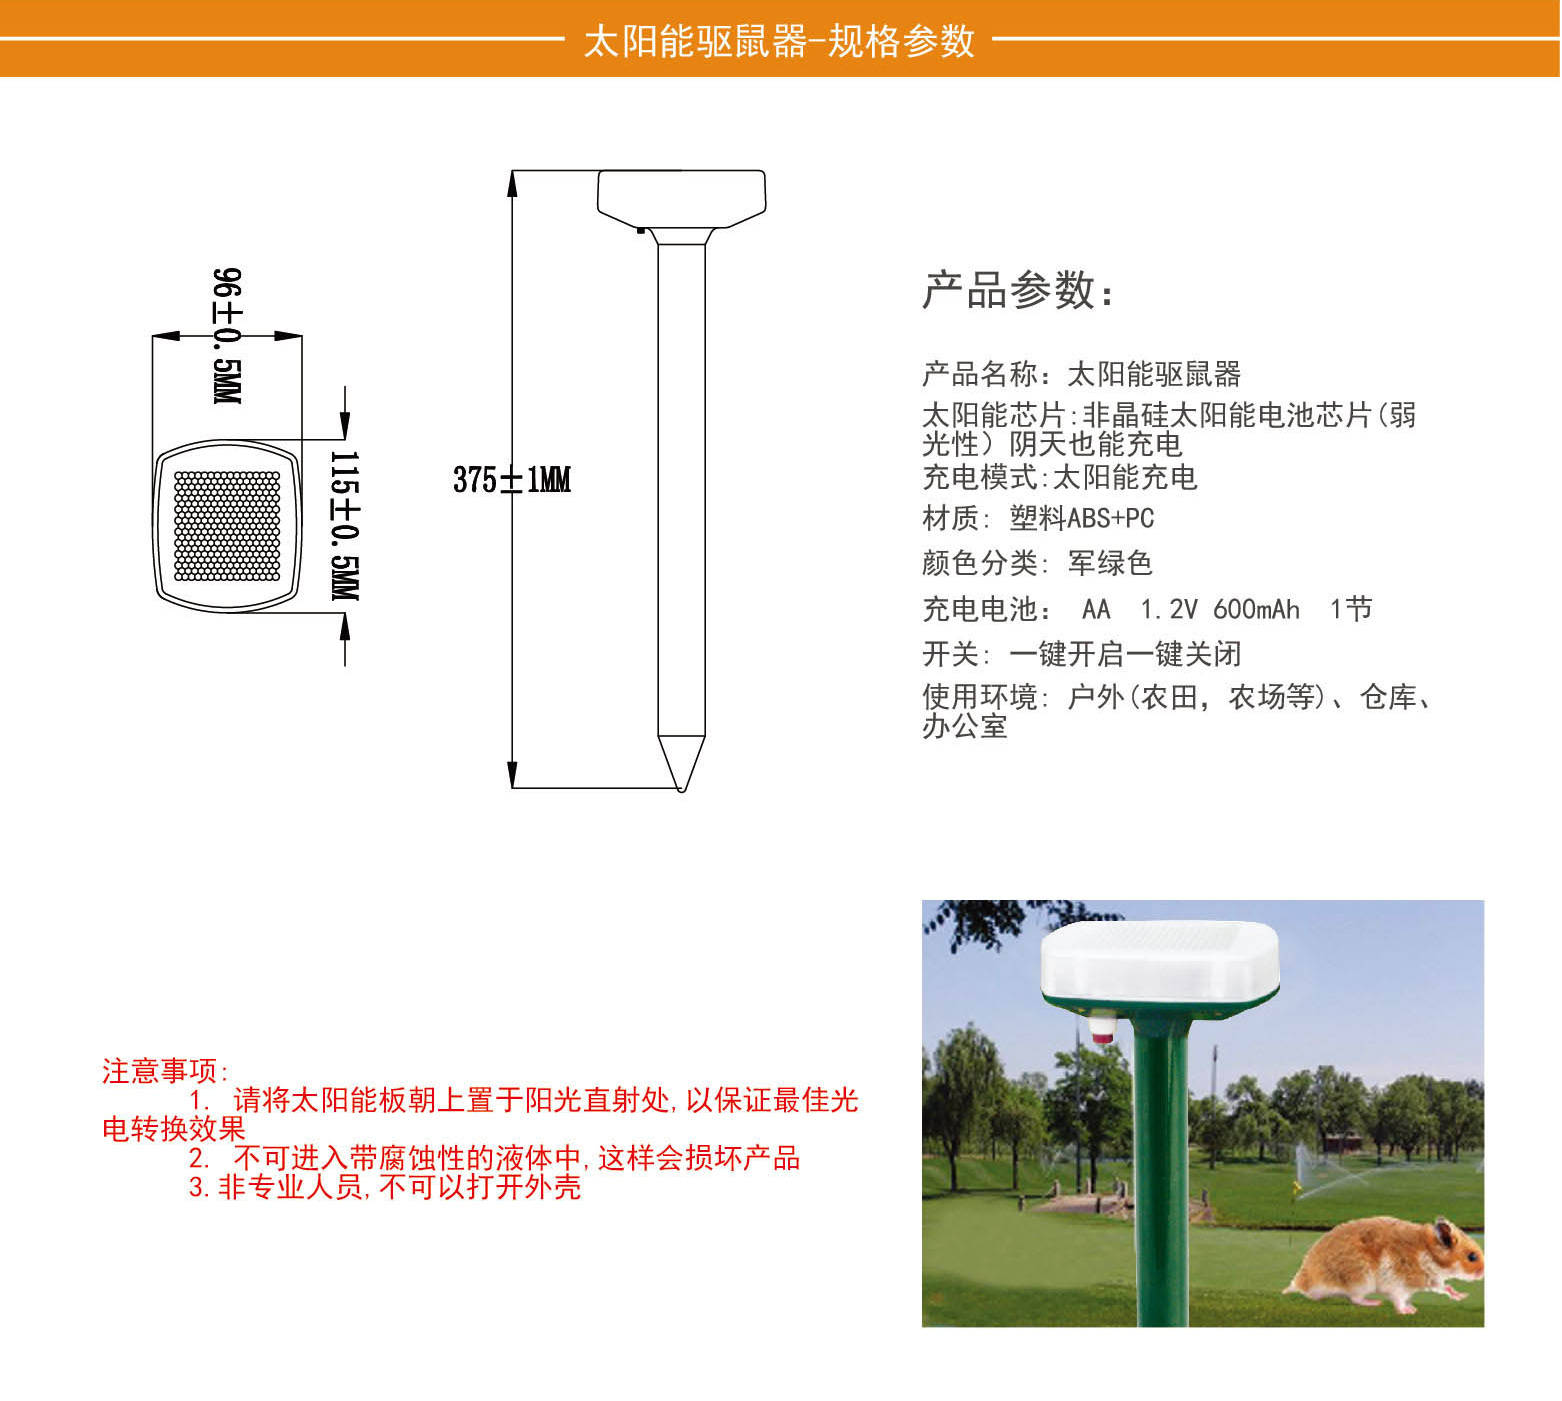 太阳能驱鼠器-4c99e4d0-359e-4d63-a4ef-73e60d6b654e